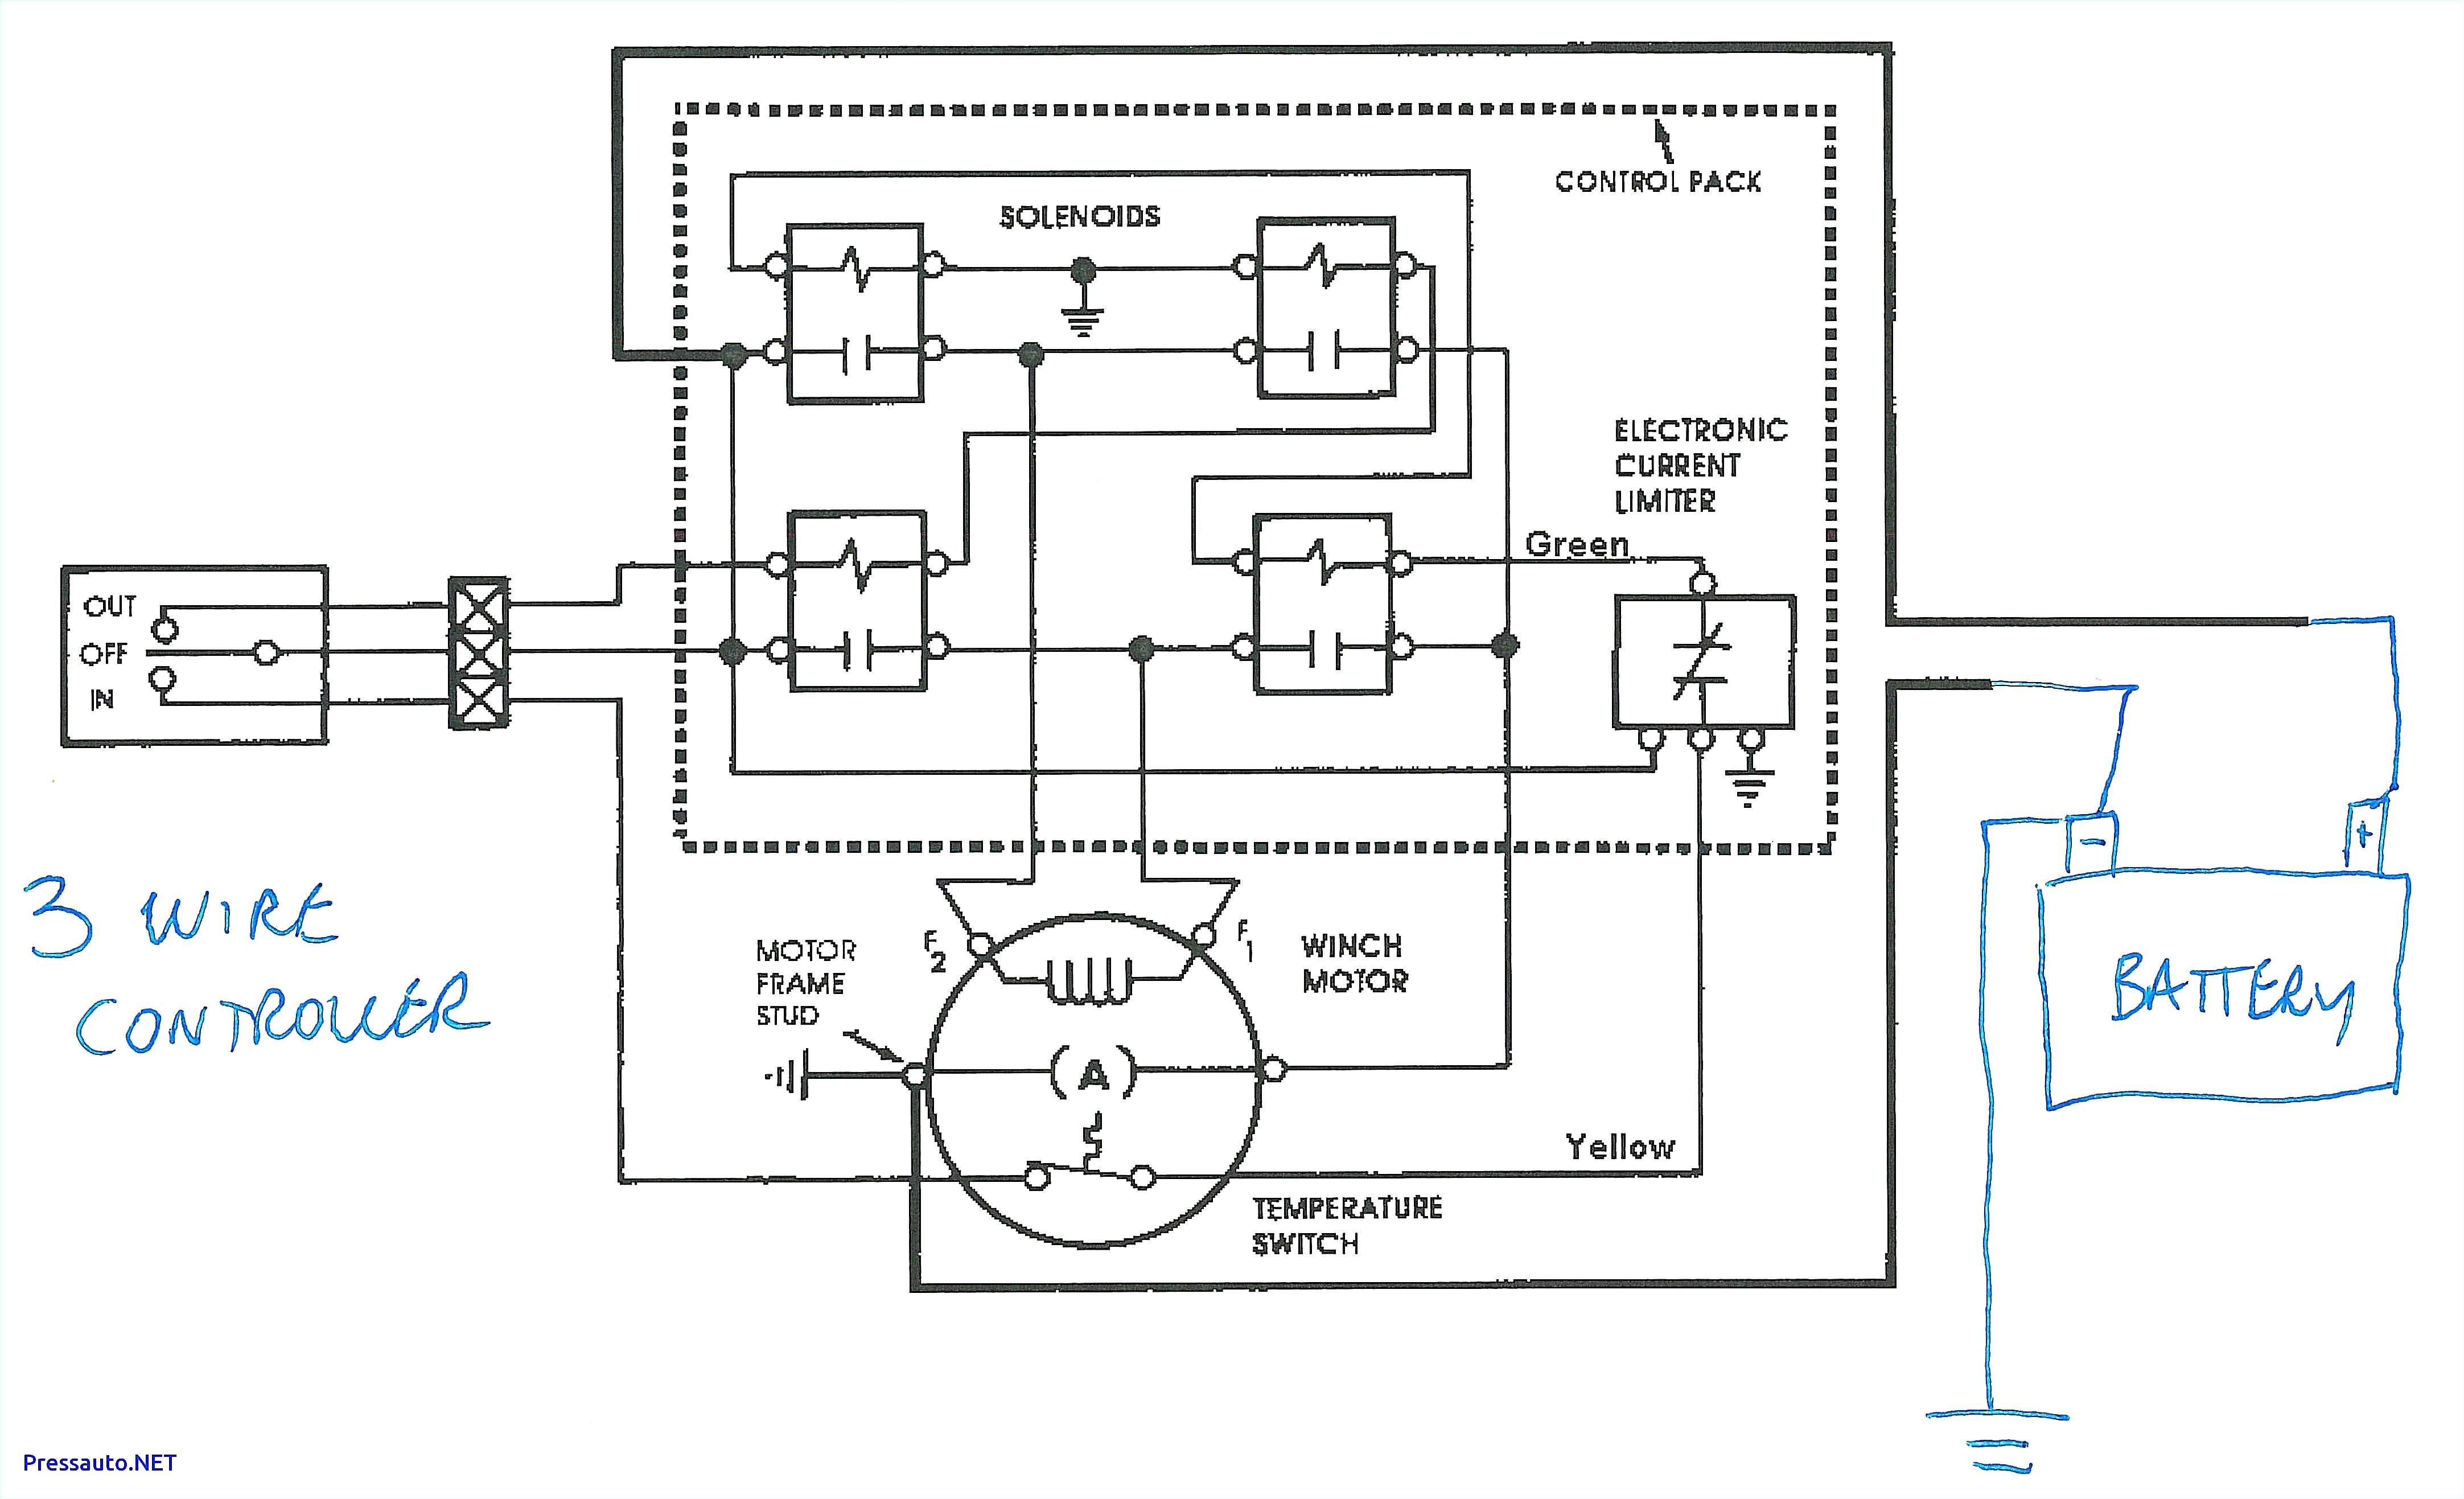 warn mx 6000 wiring diagram wiring diagram paper 8274 warn winch wiring diagram wiring diagram technic